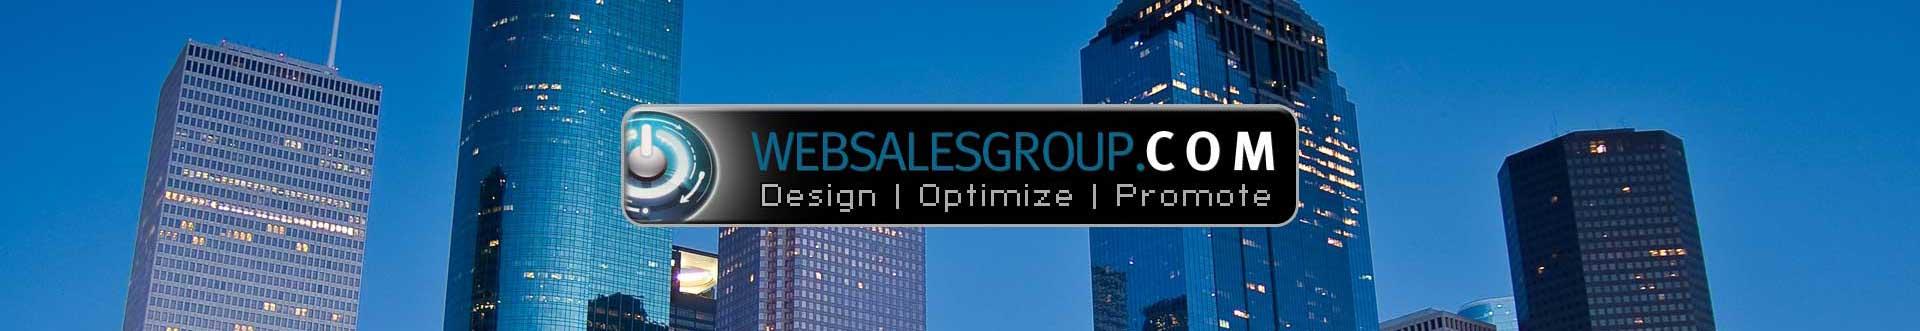 Houston Web Design Company